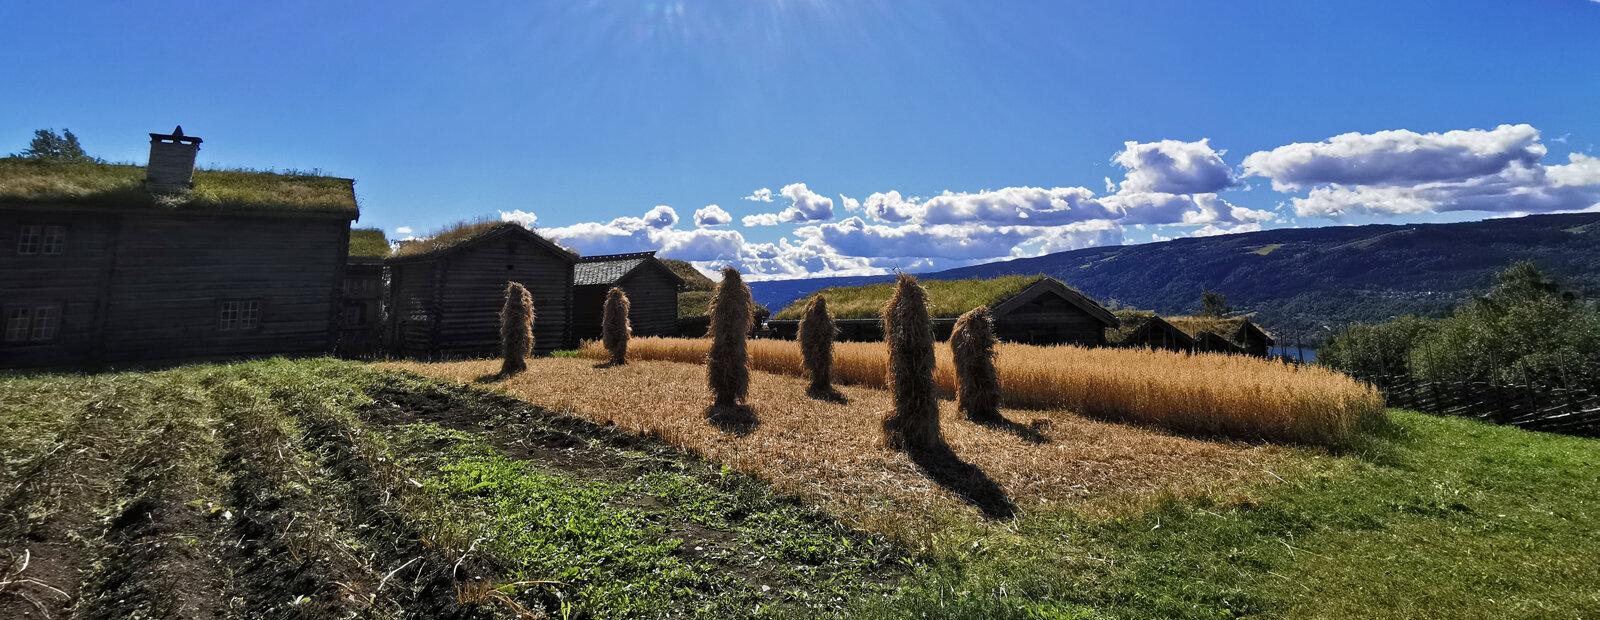 Sheaf of grain on poles.